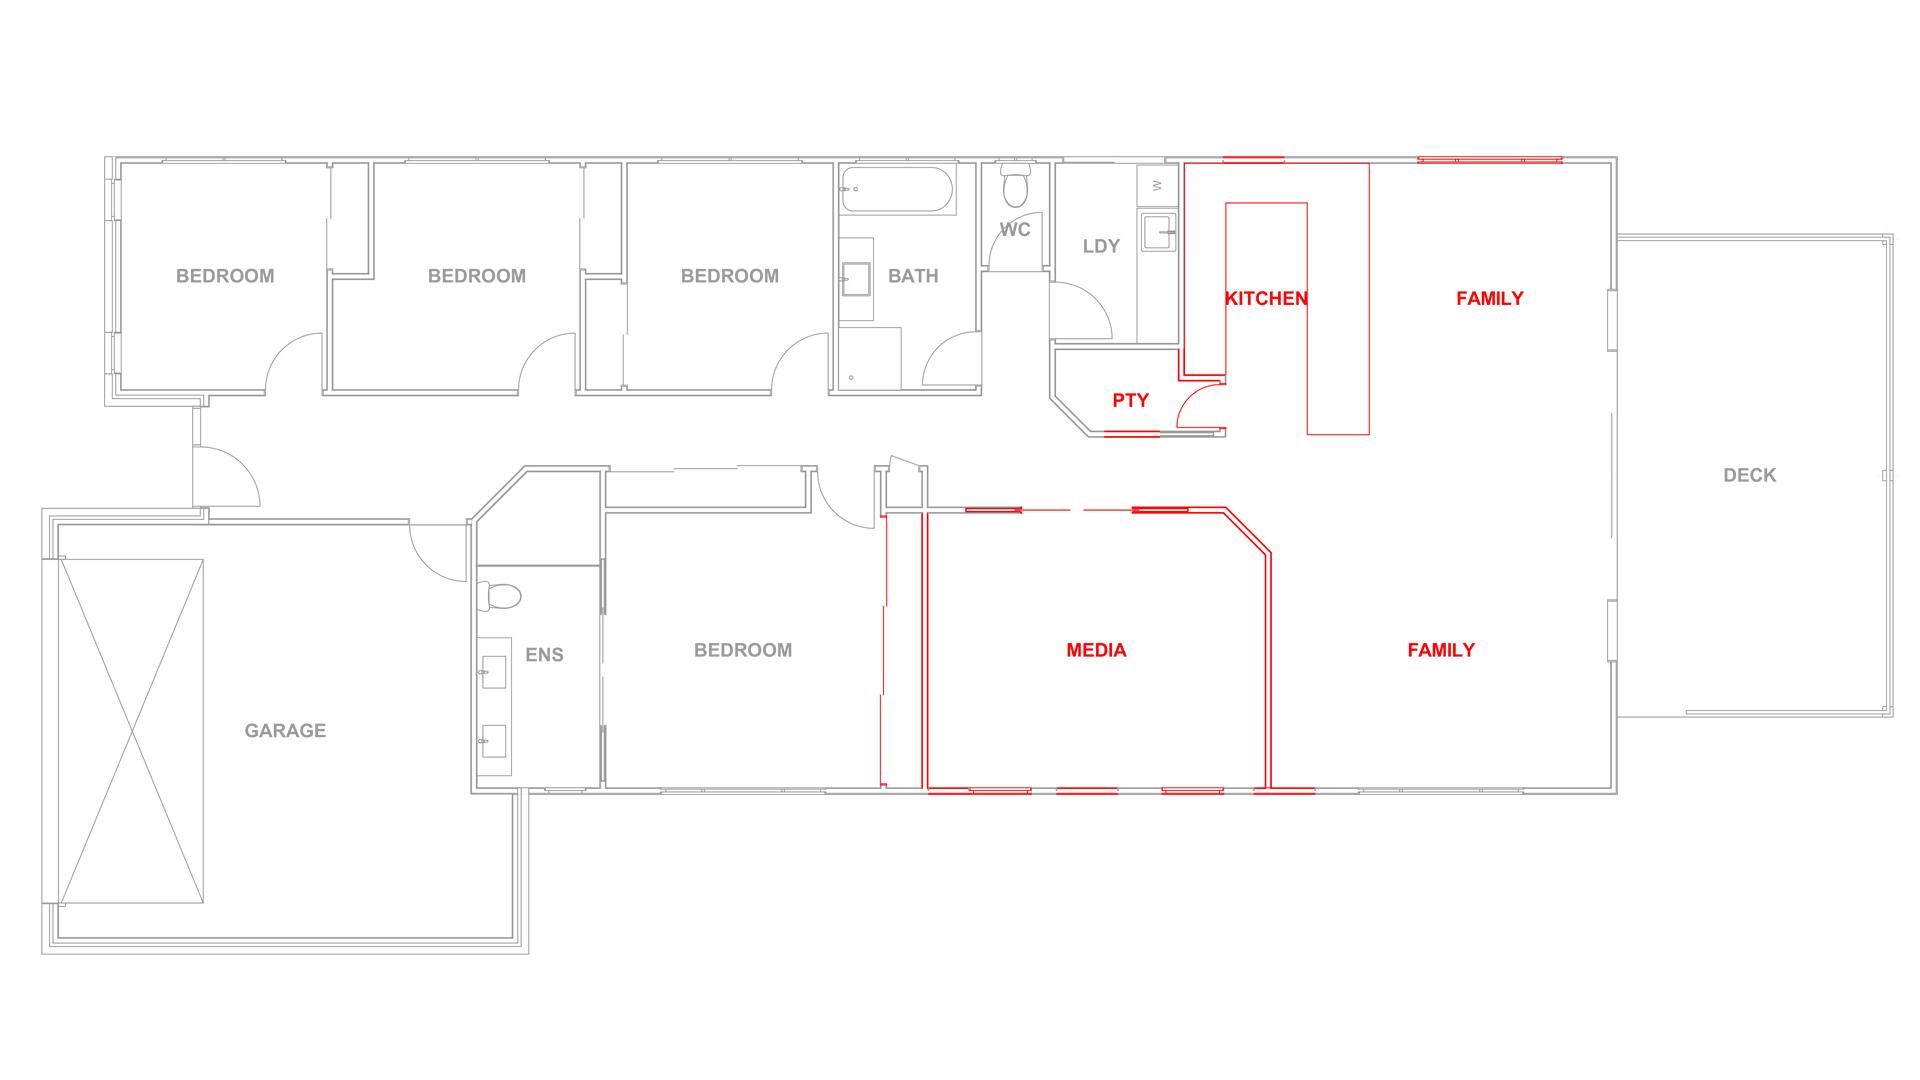 Demolition plan - House Renovation